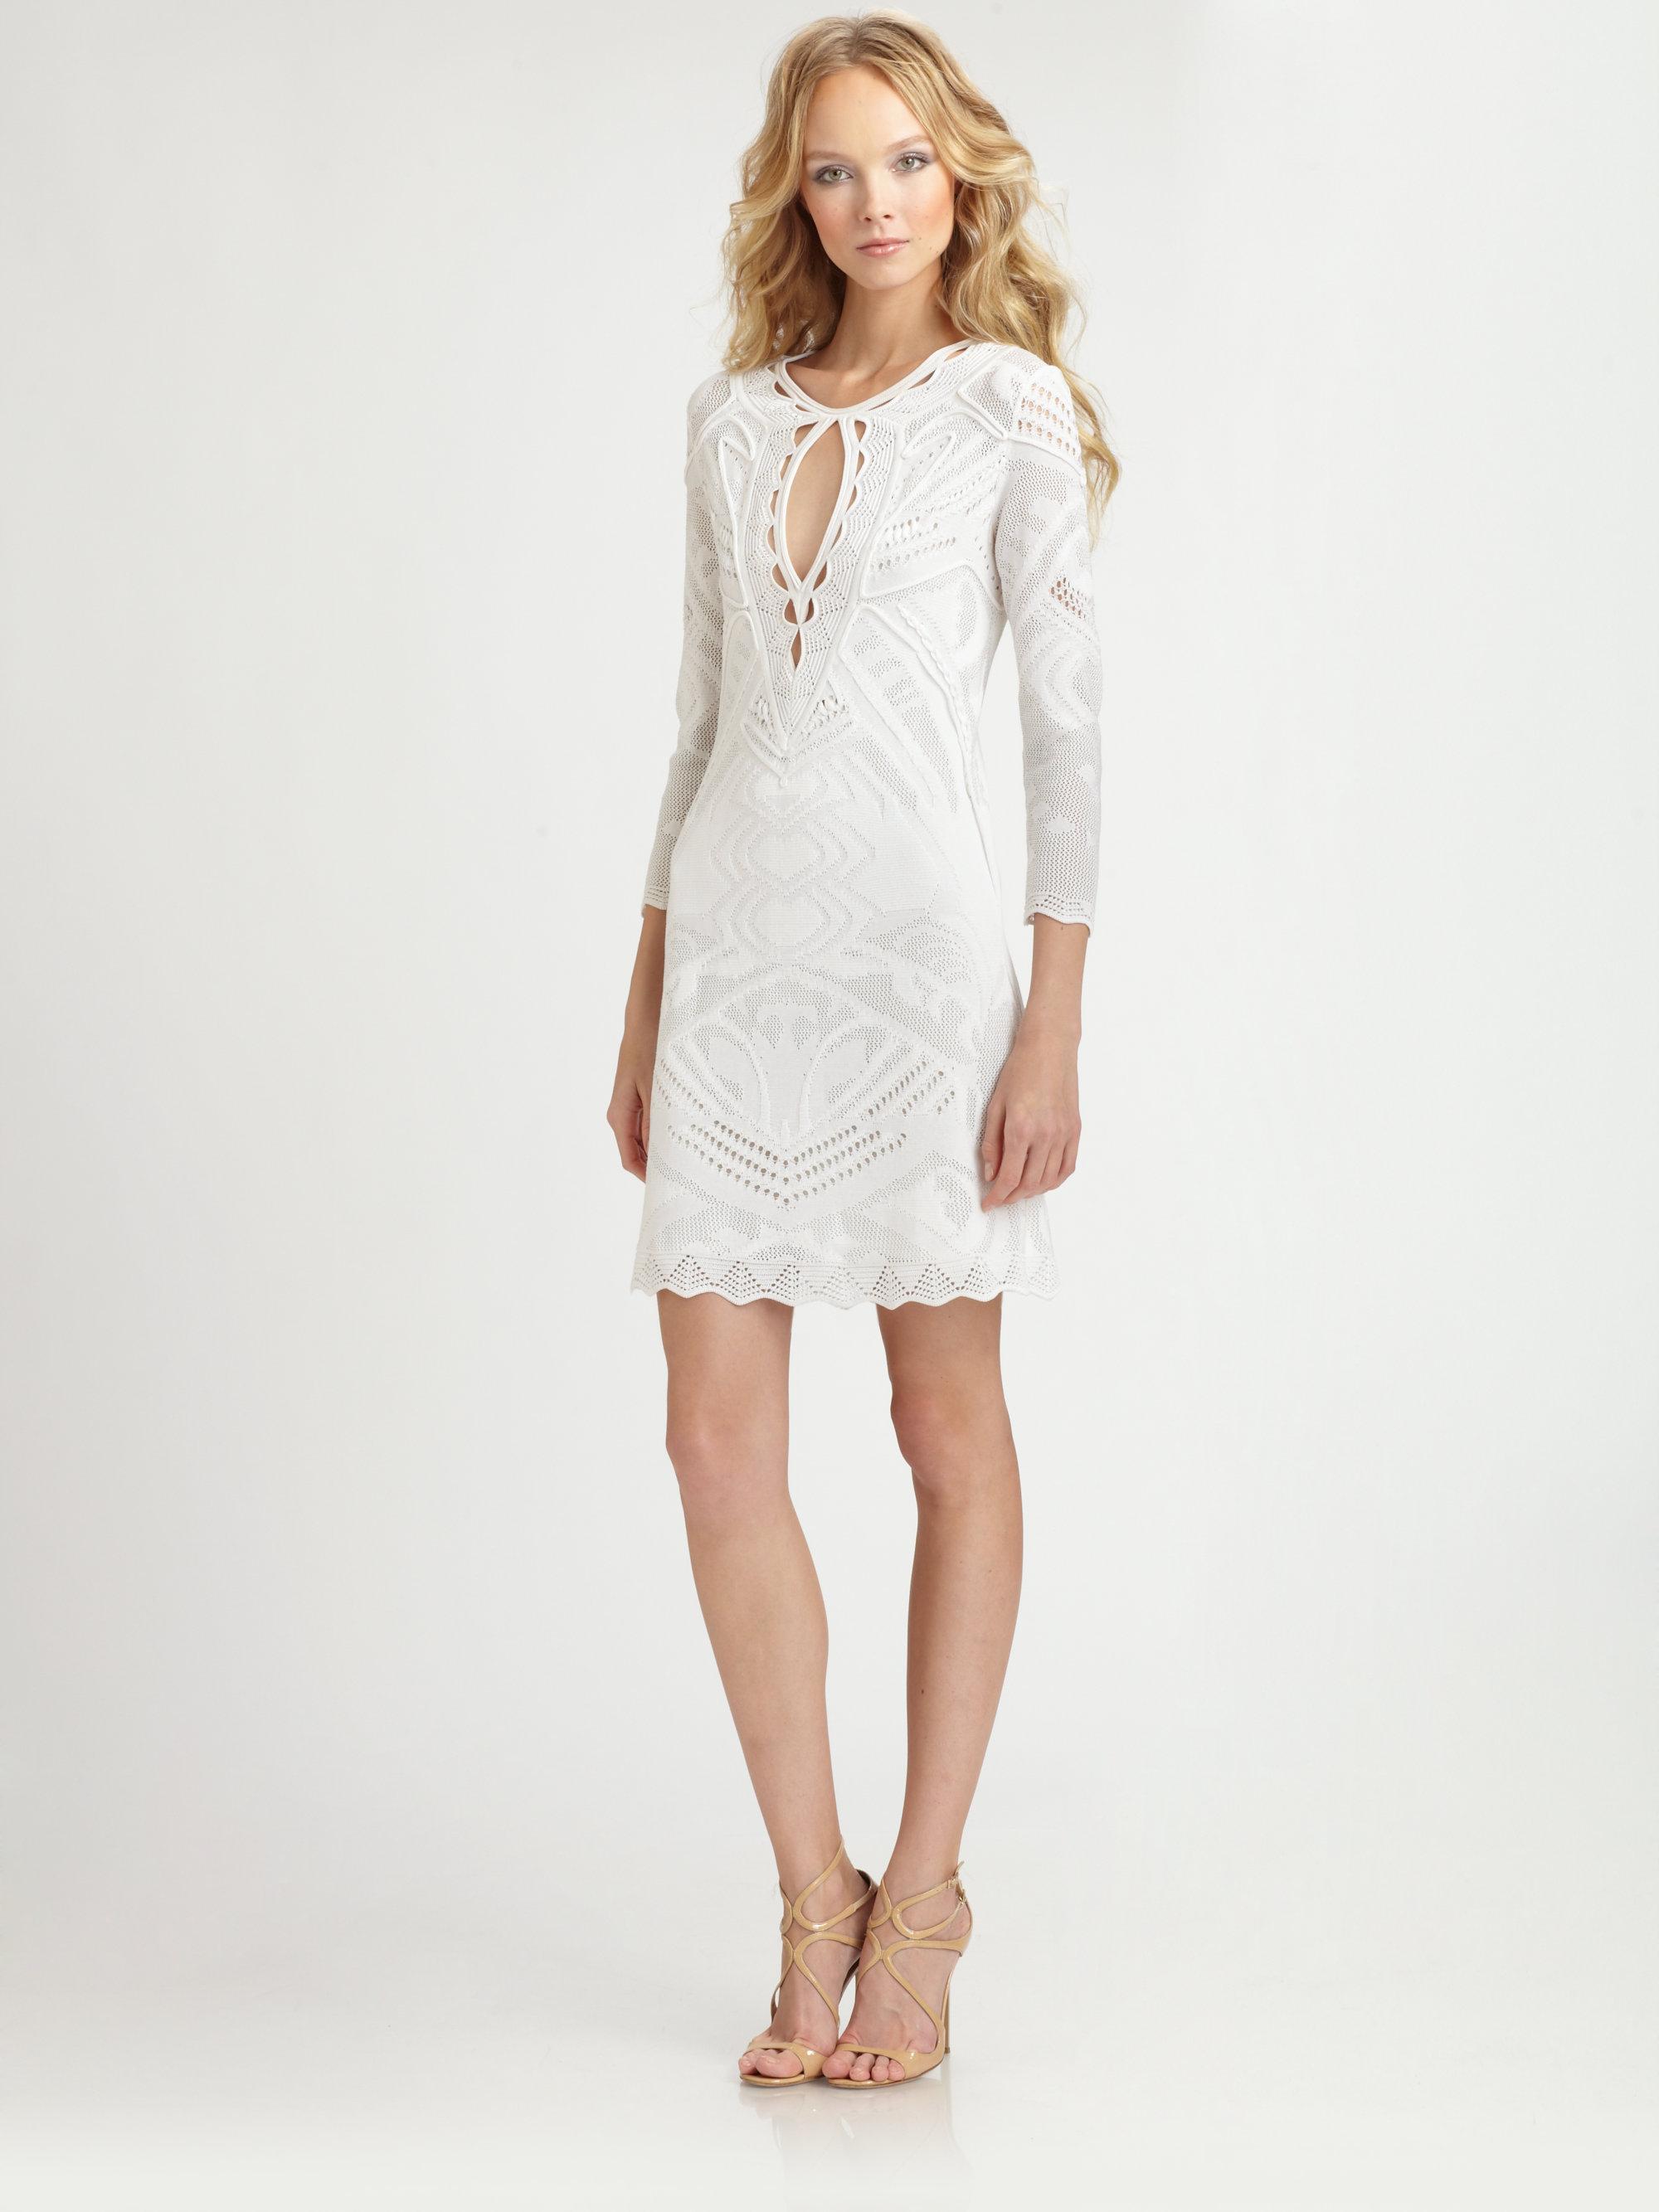 Roberto Cavalli White Dress